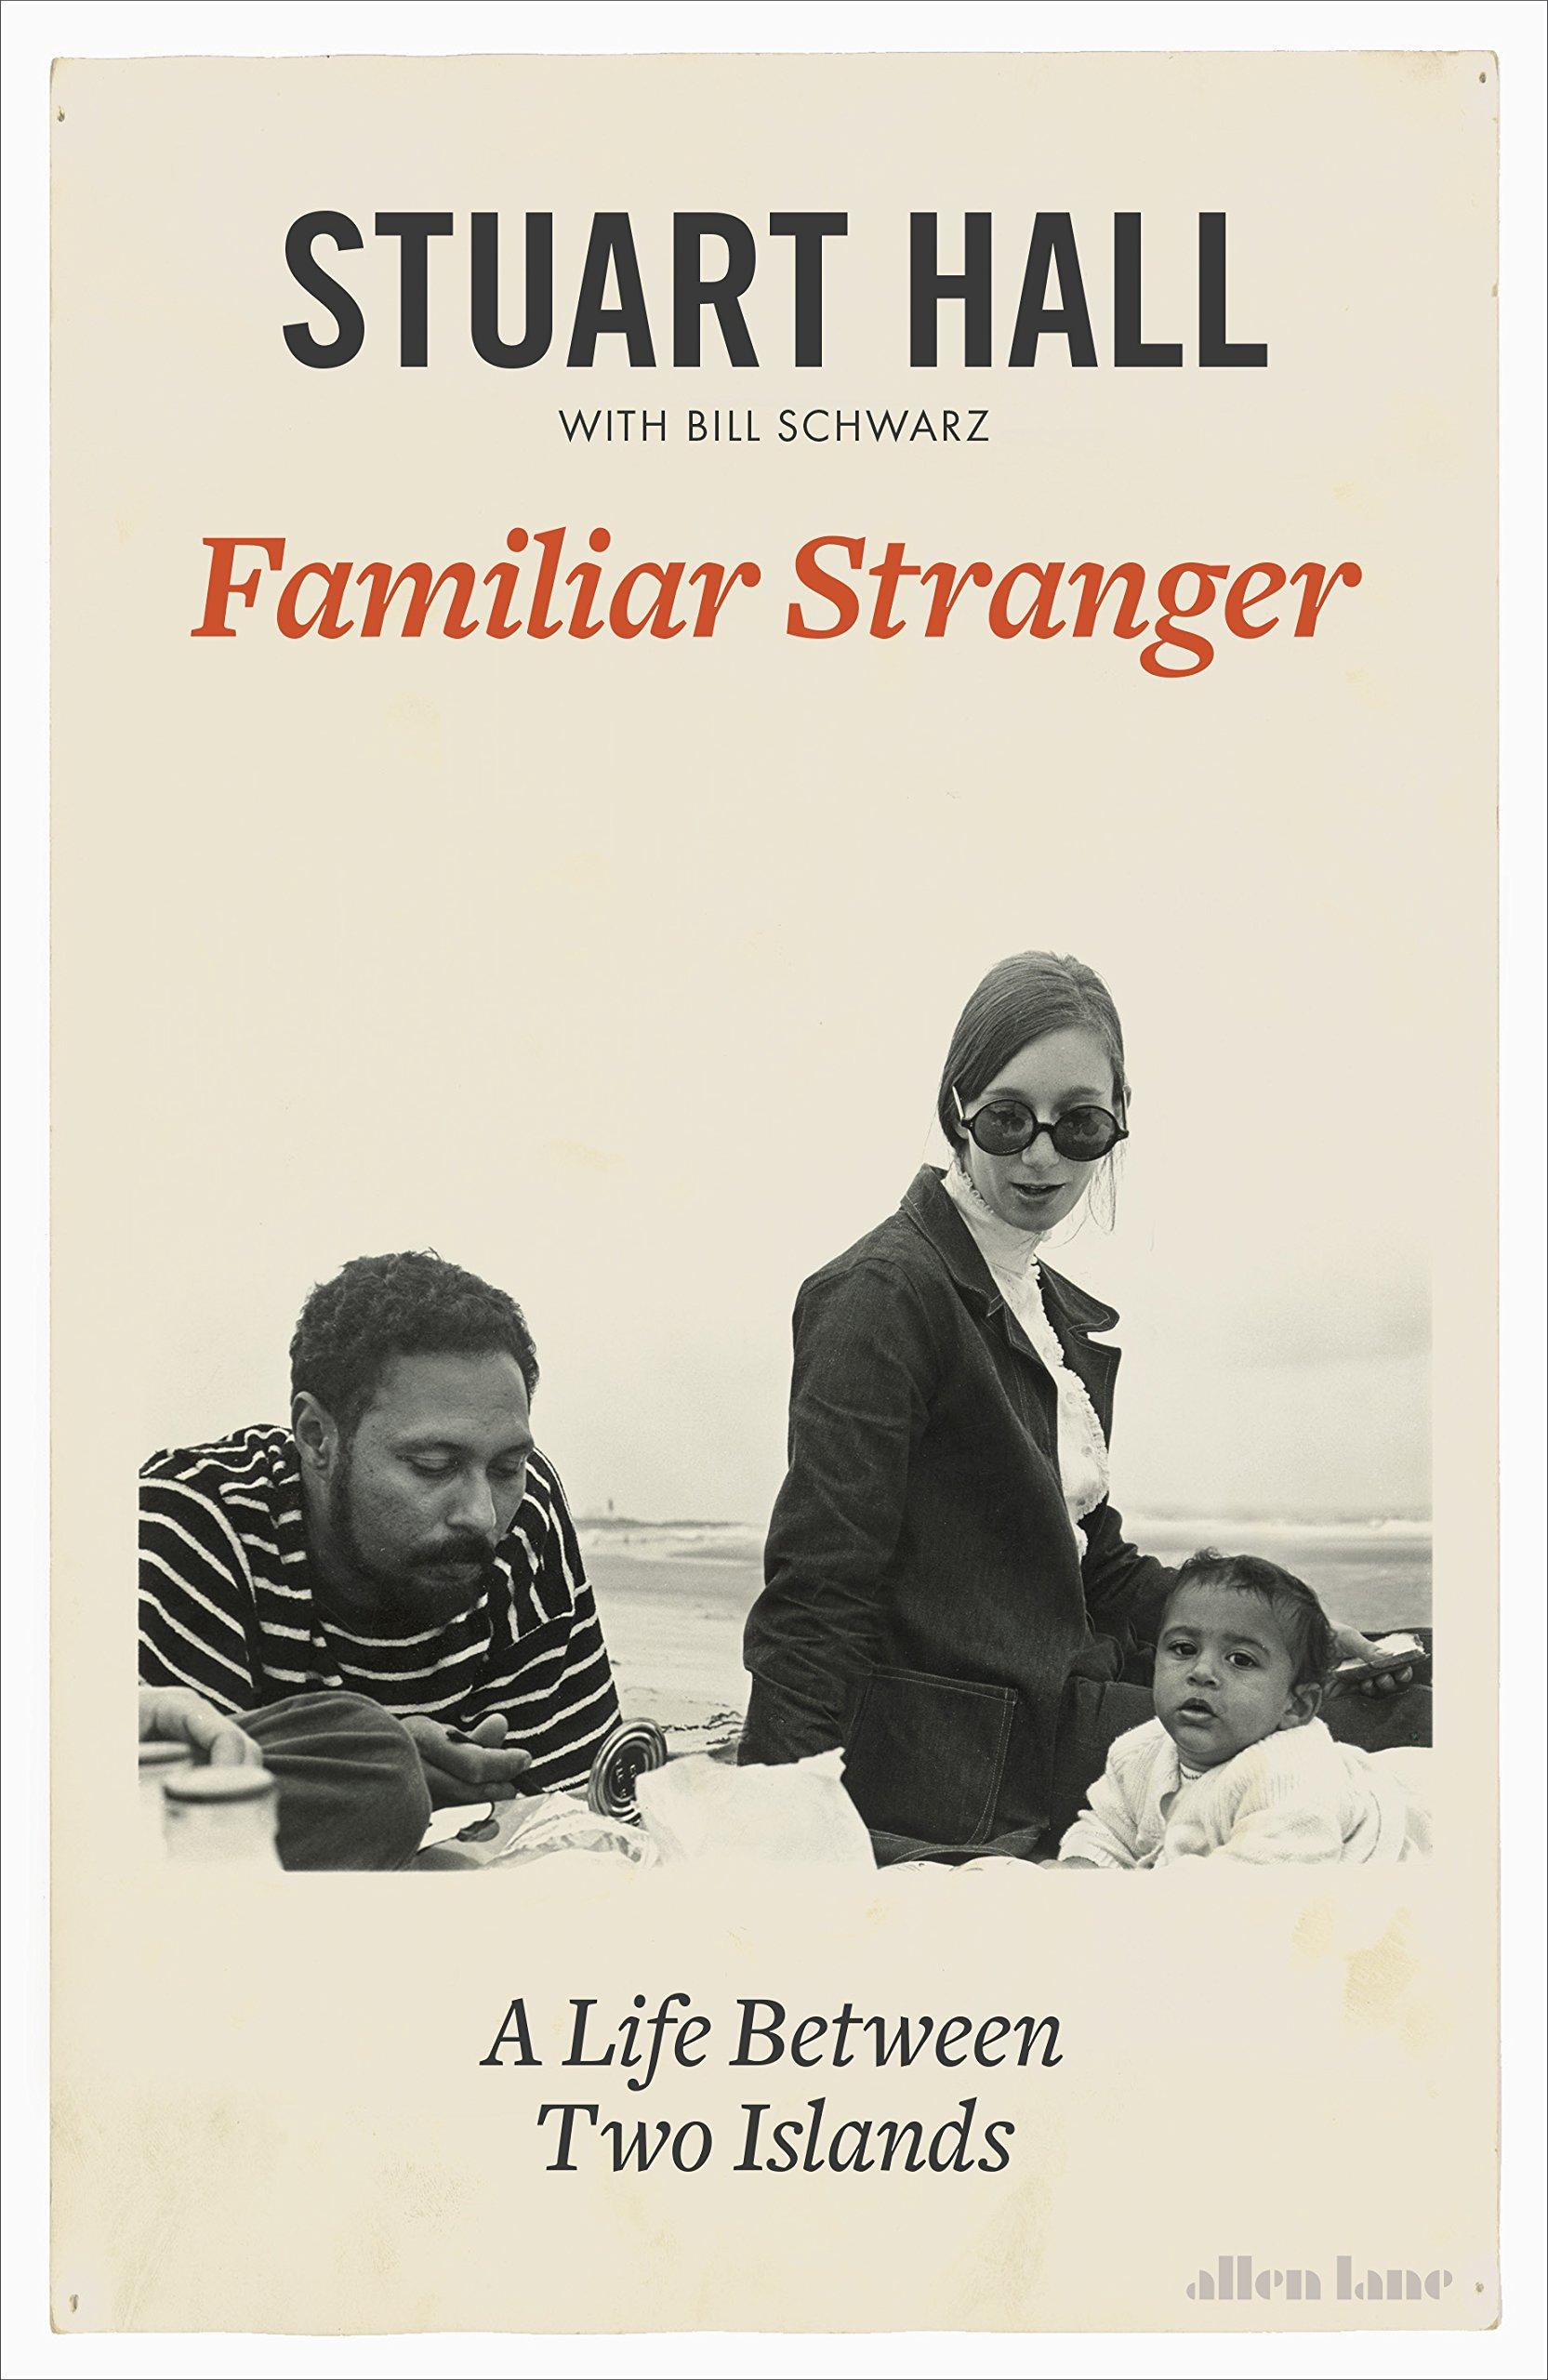 Familiar stranger a life between two islands amazon co uk stuart hall 9780241289990 books